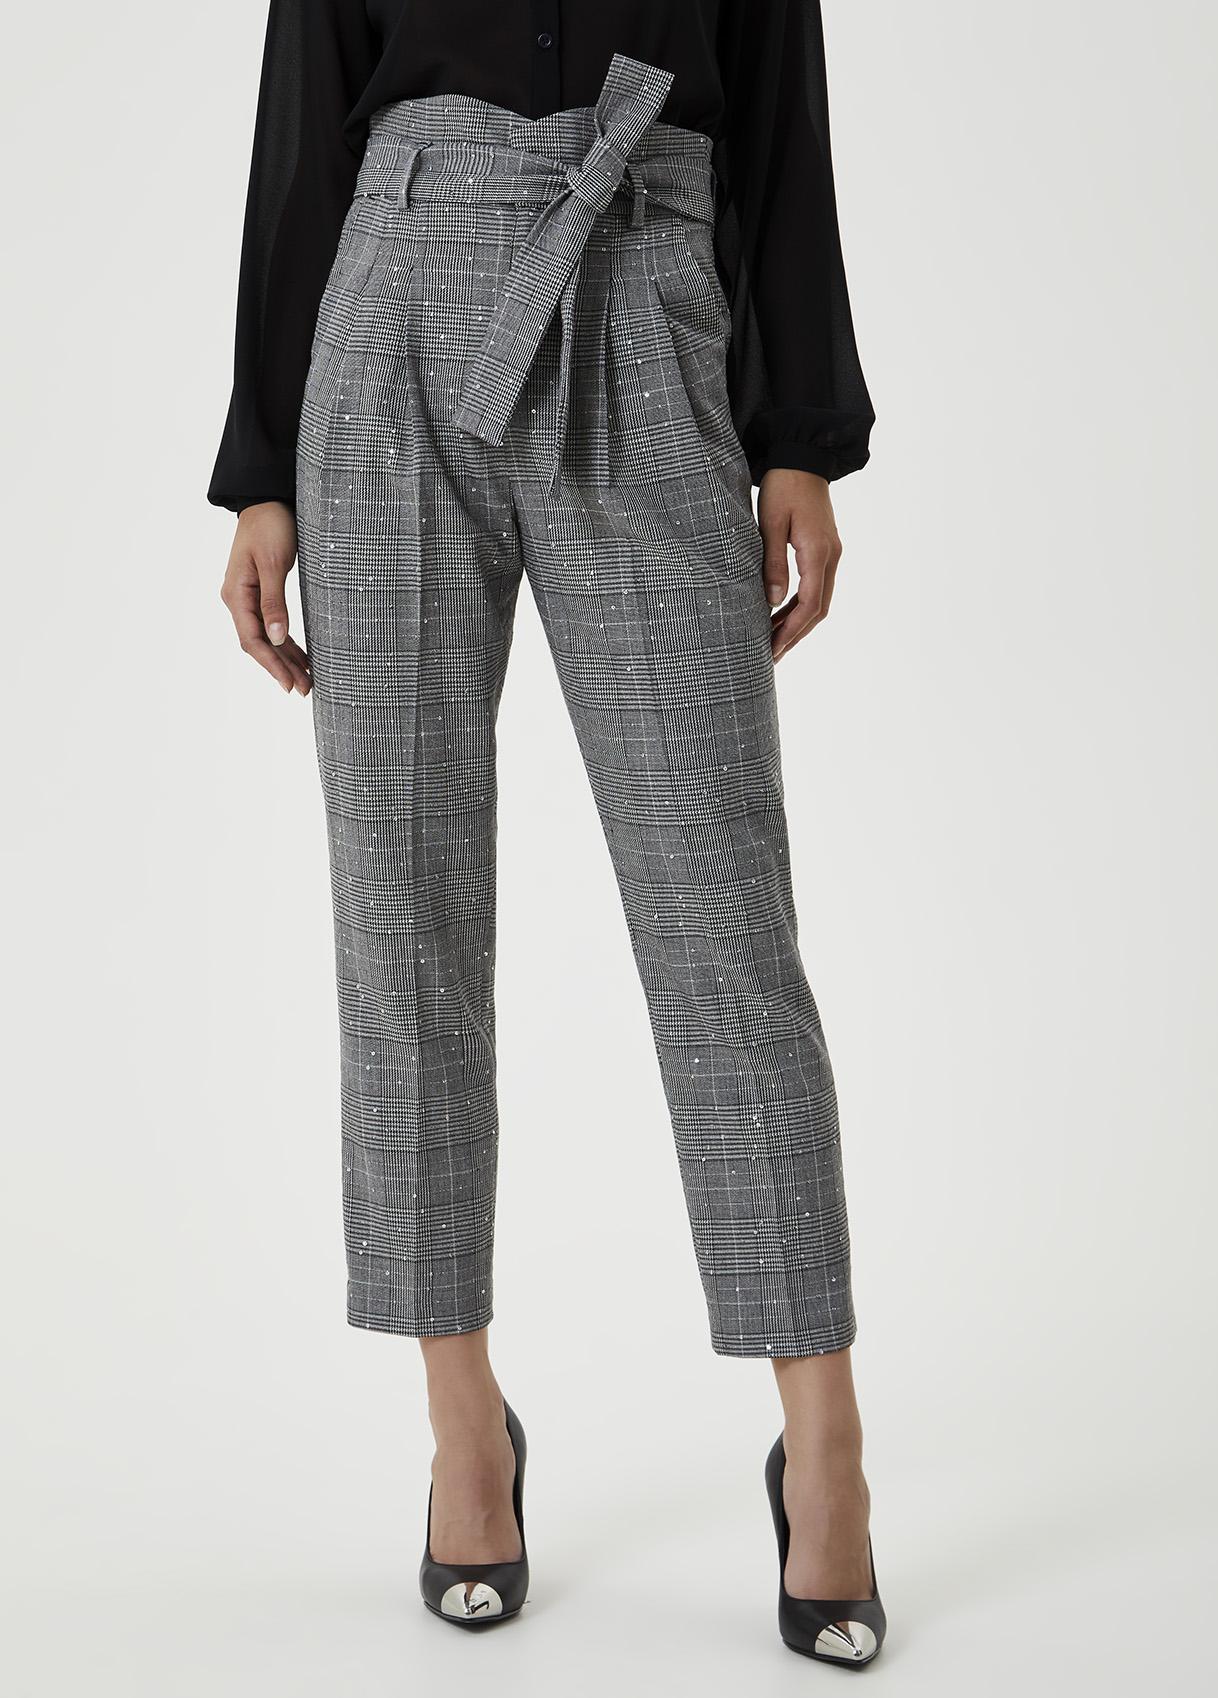 Pantalone elegante con fiocco Grigio Liu Jo - large